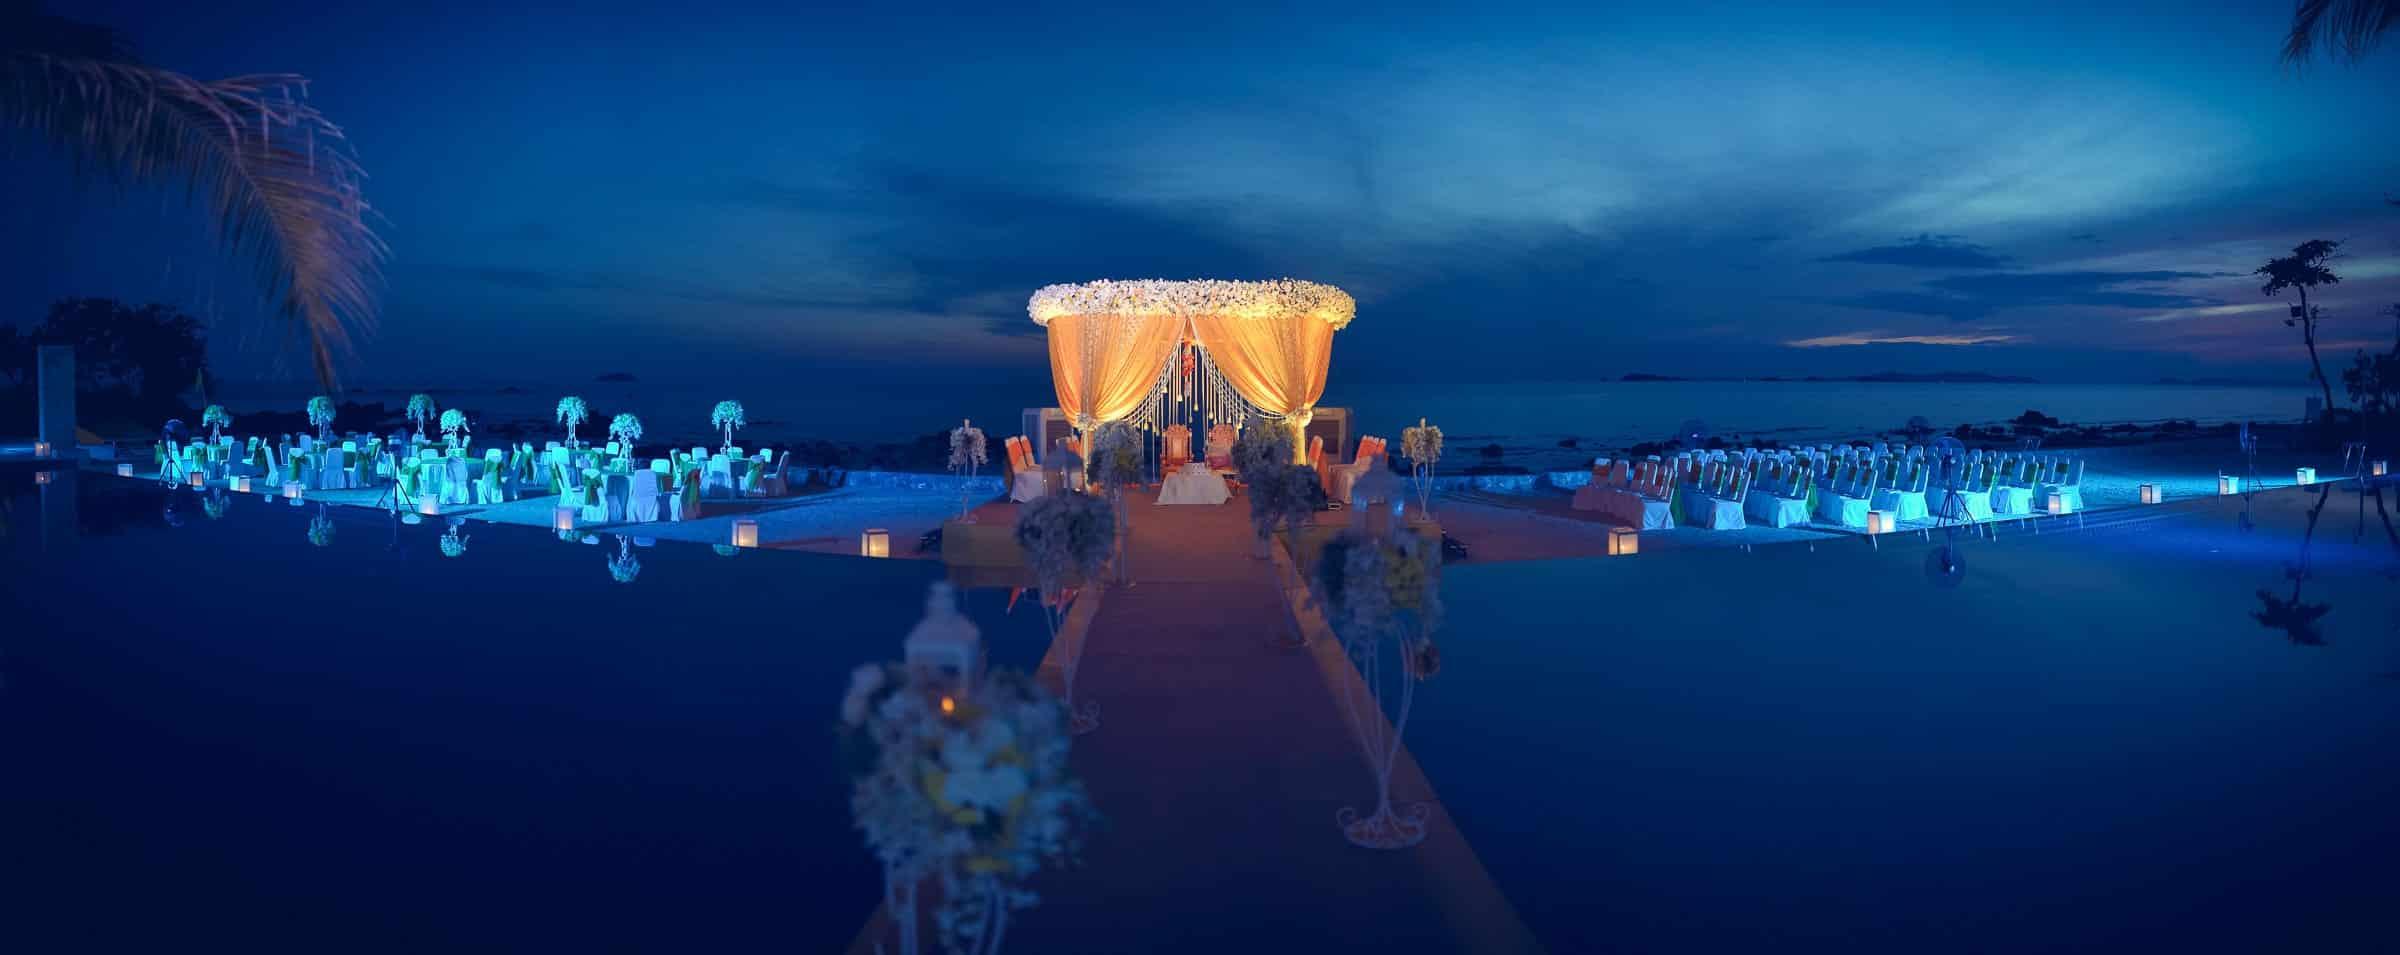 Best Destination Wedding Photographer Rayong Mariott | Indian Venue Decor Panorama Photography Thailand